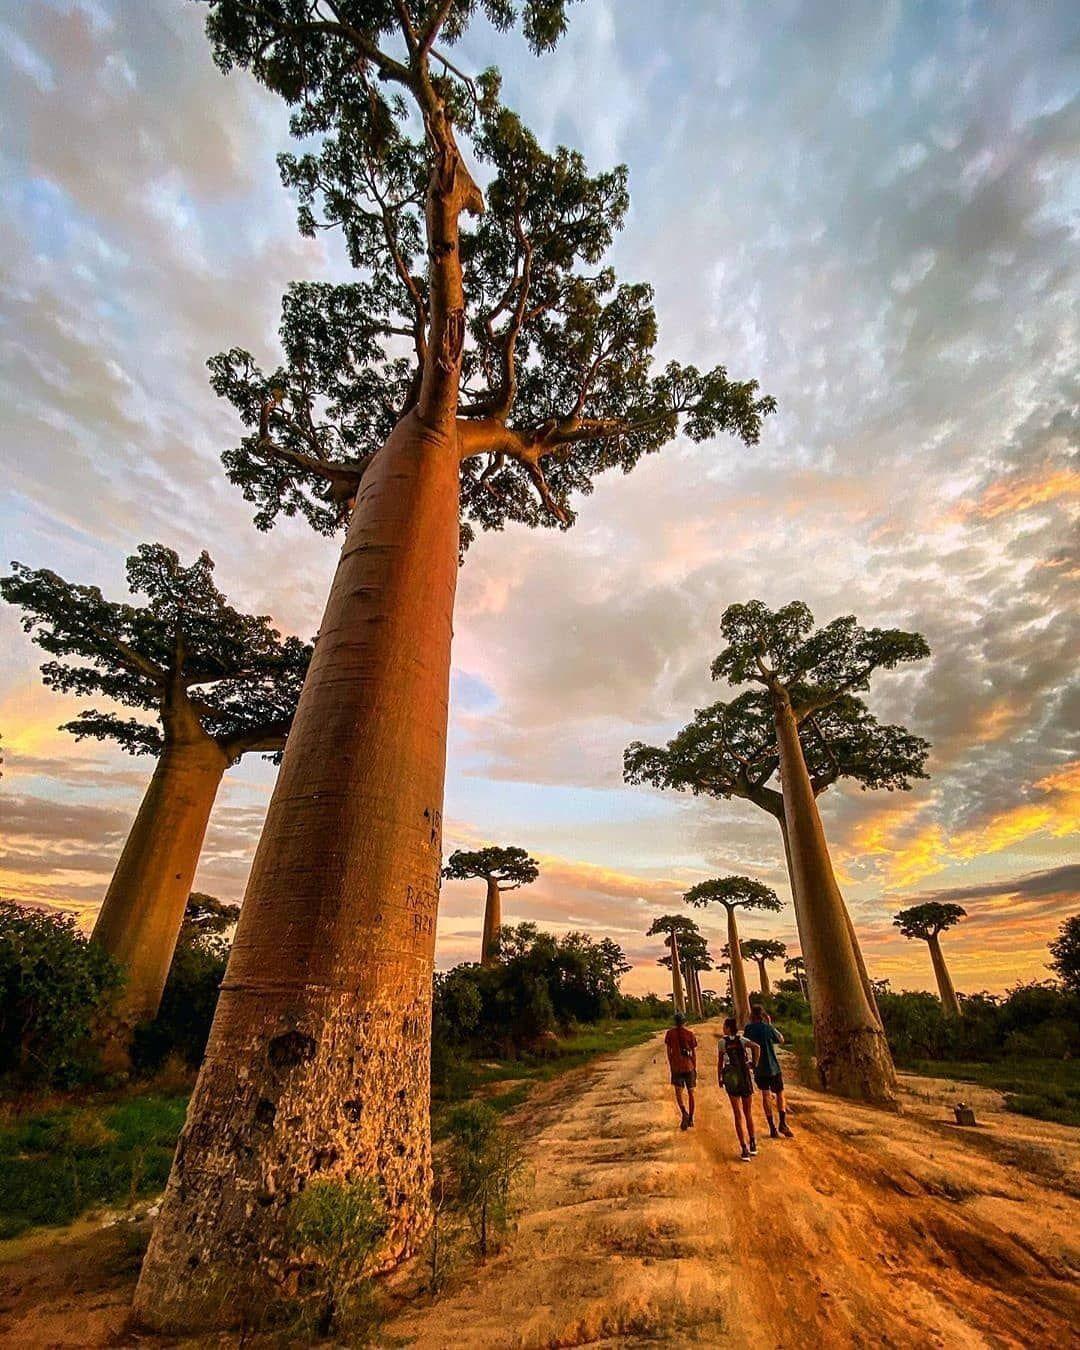 Baobab Nature Photography Africa Travel Africa Road Wildlife Photo Africa Nature Sunset Nature Instagram Nature Photo